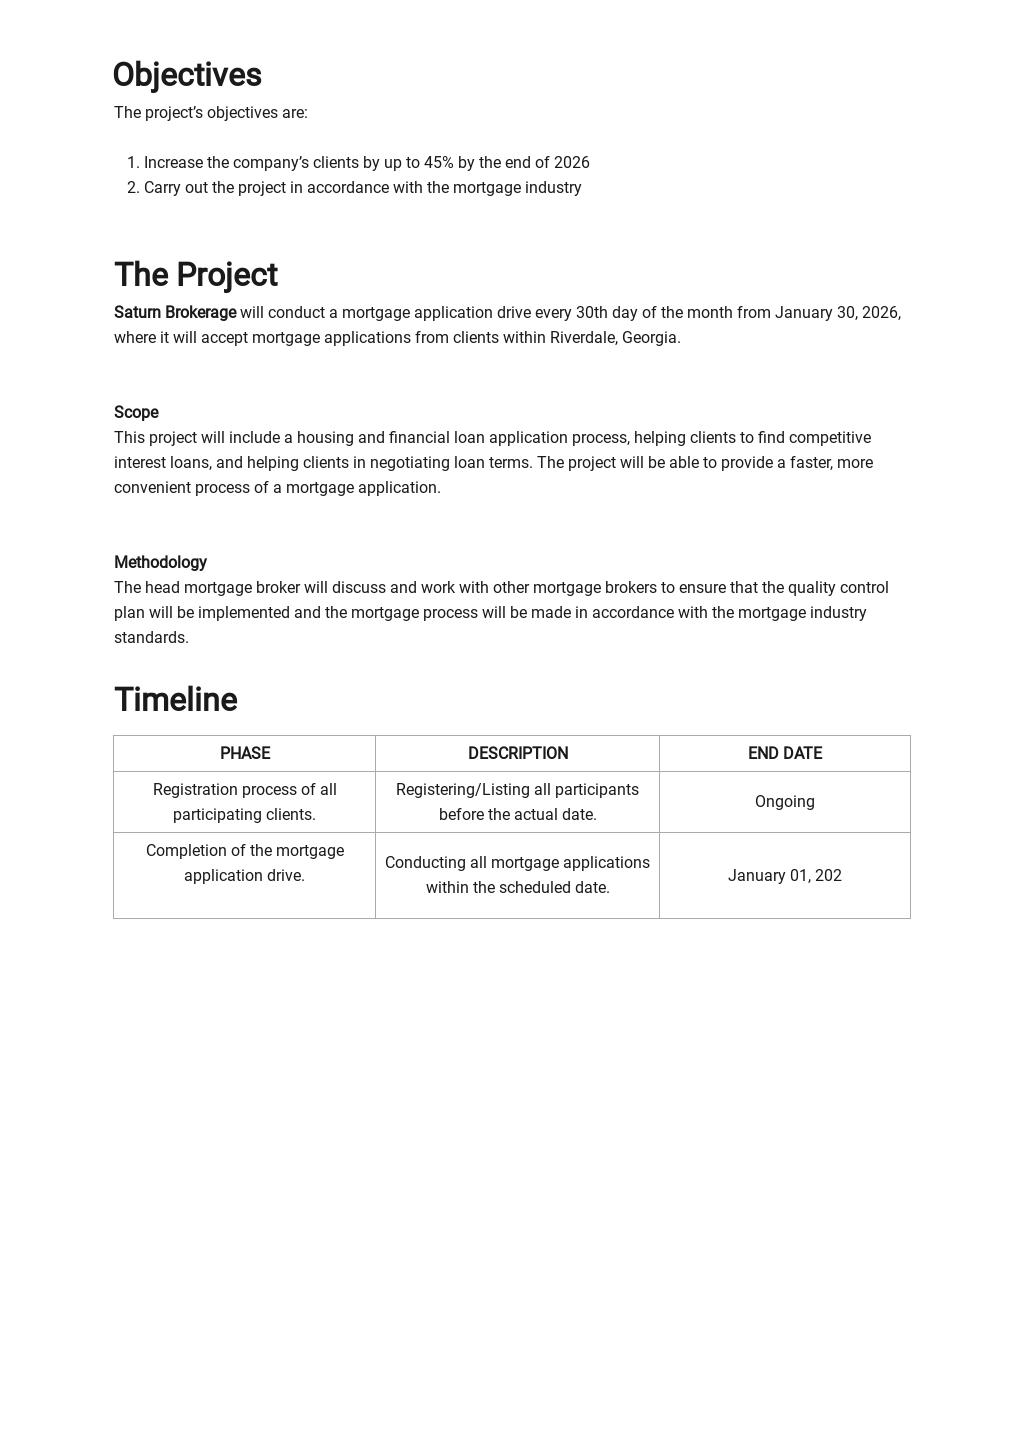 Mortgage Broker Quality Control Plan Template 1.jpe